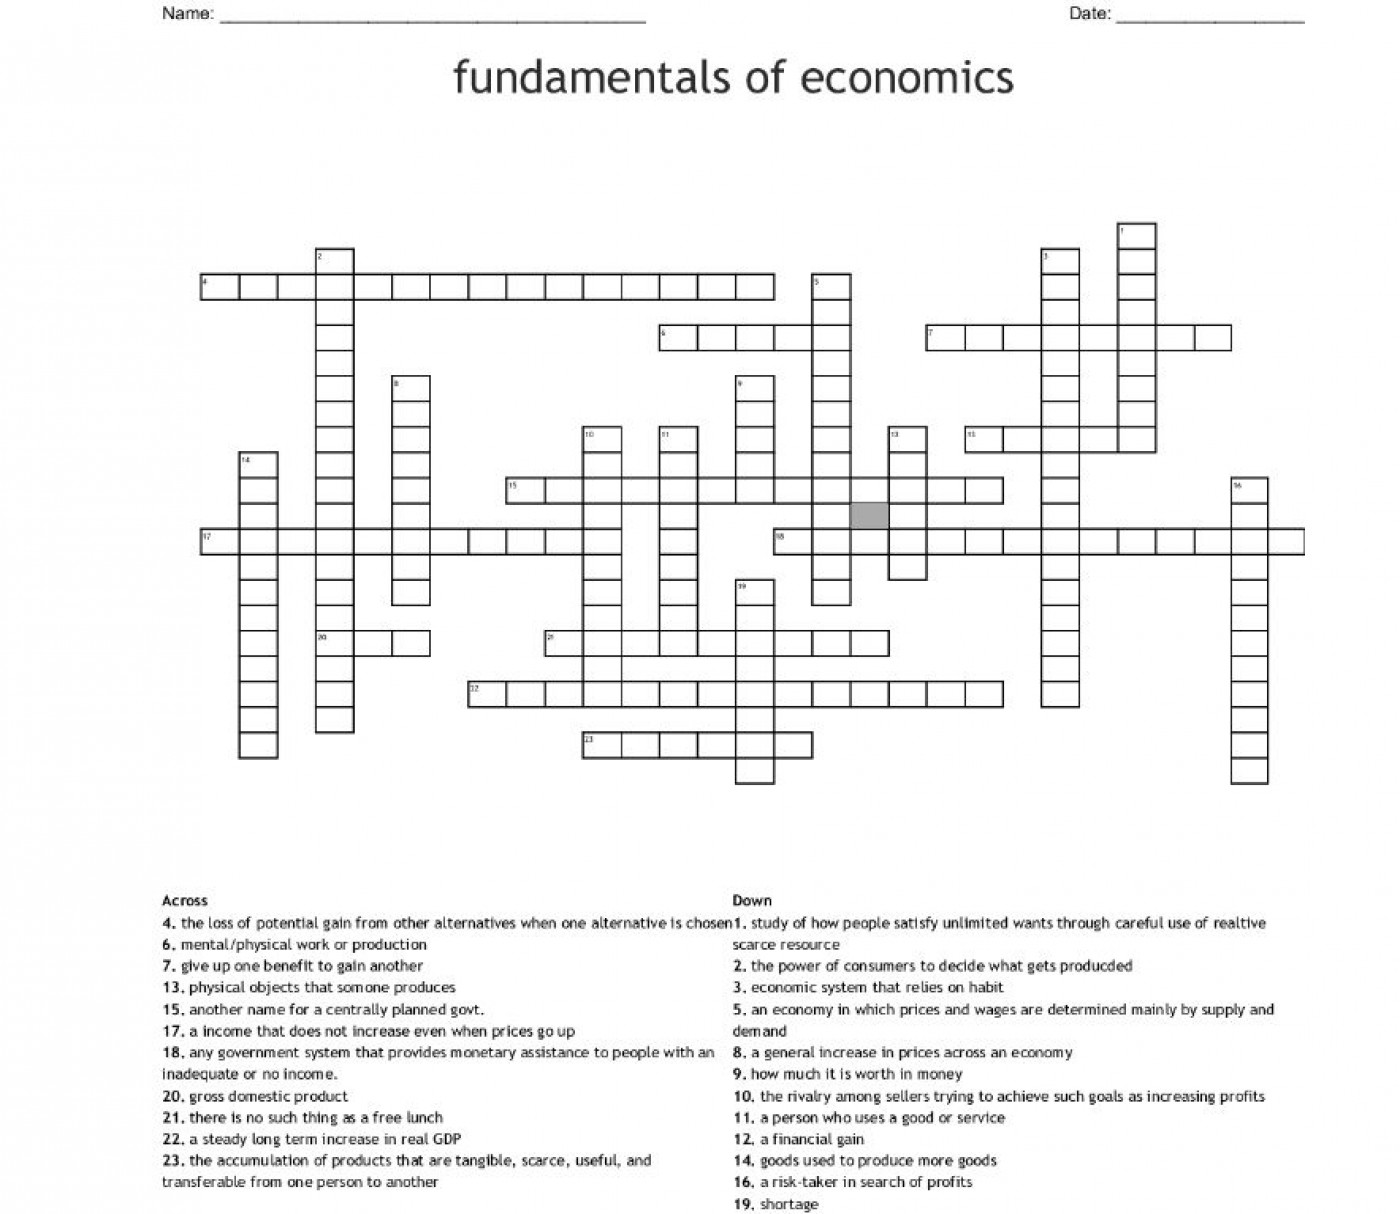 001 Imposing Prosperity Crossword Picture  Sound Clue Material1400